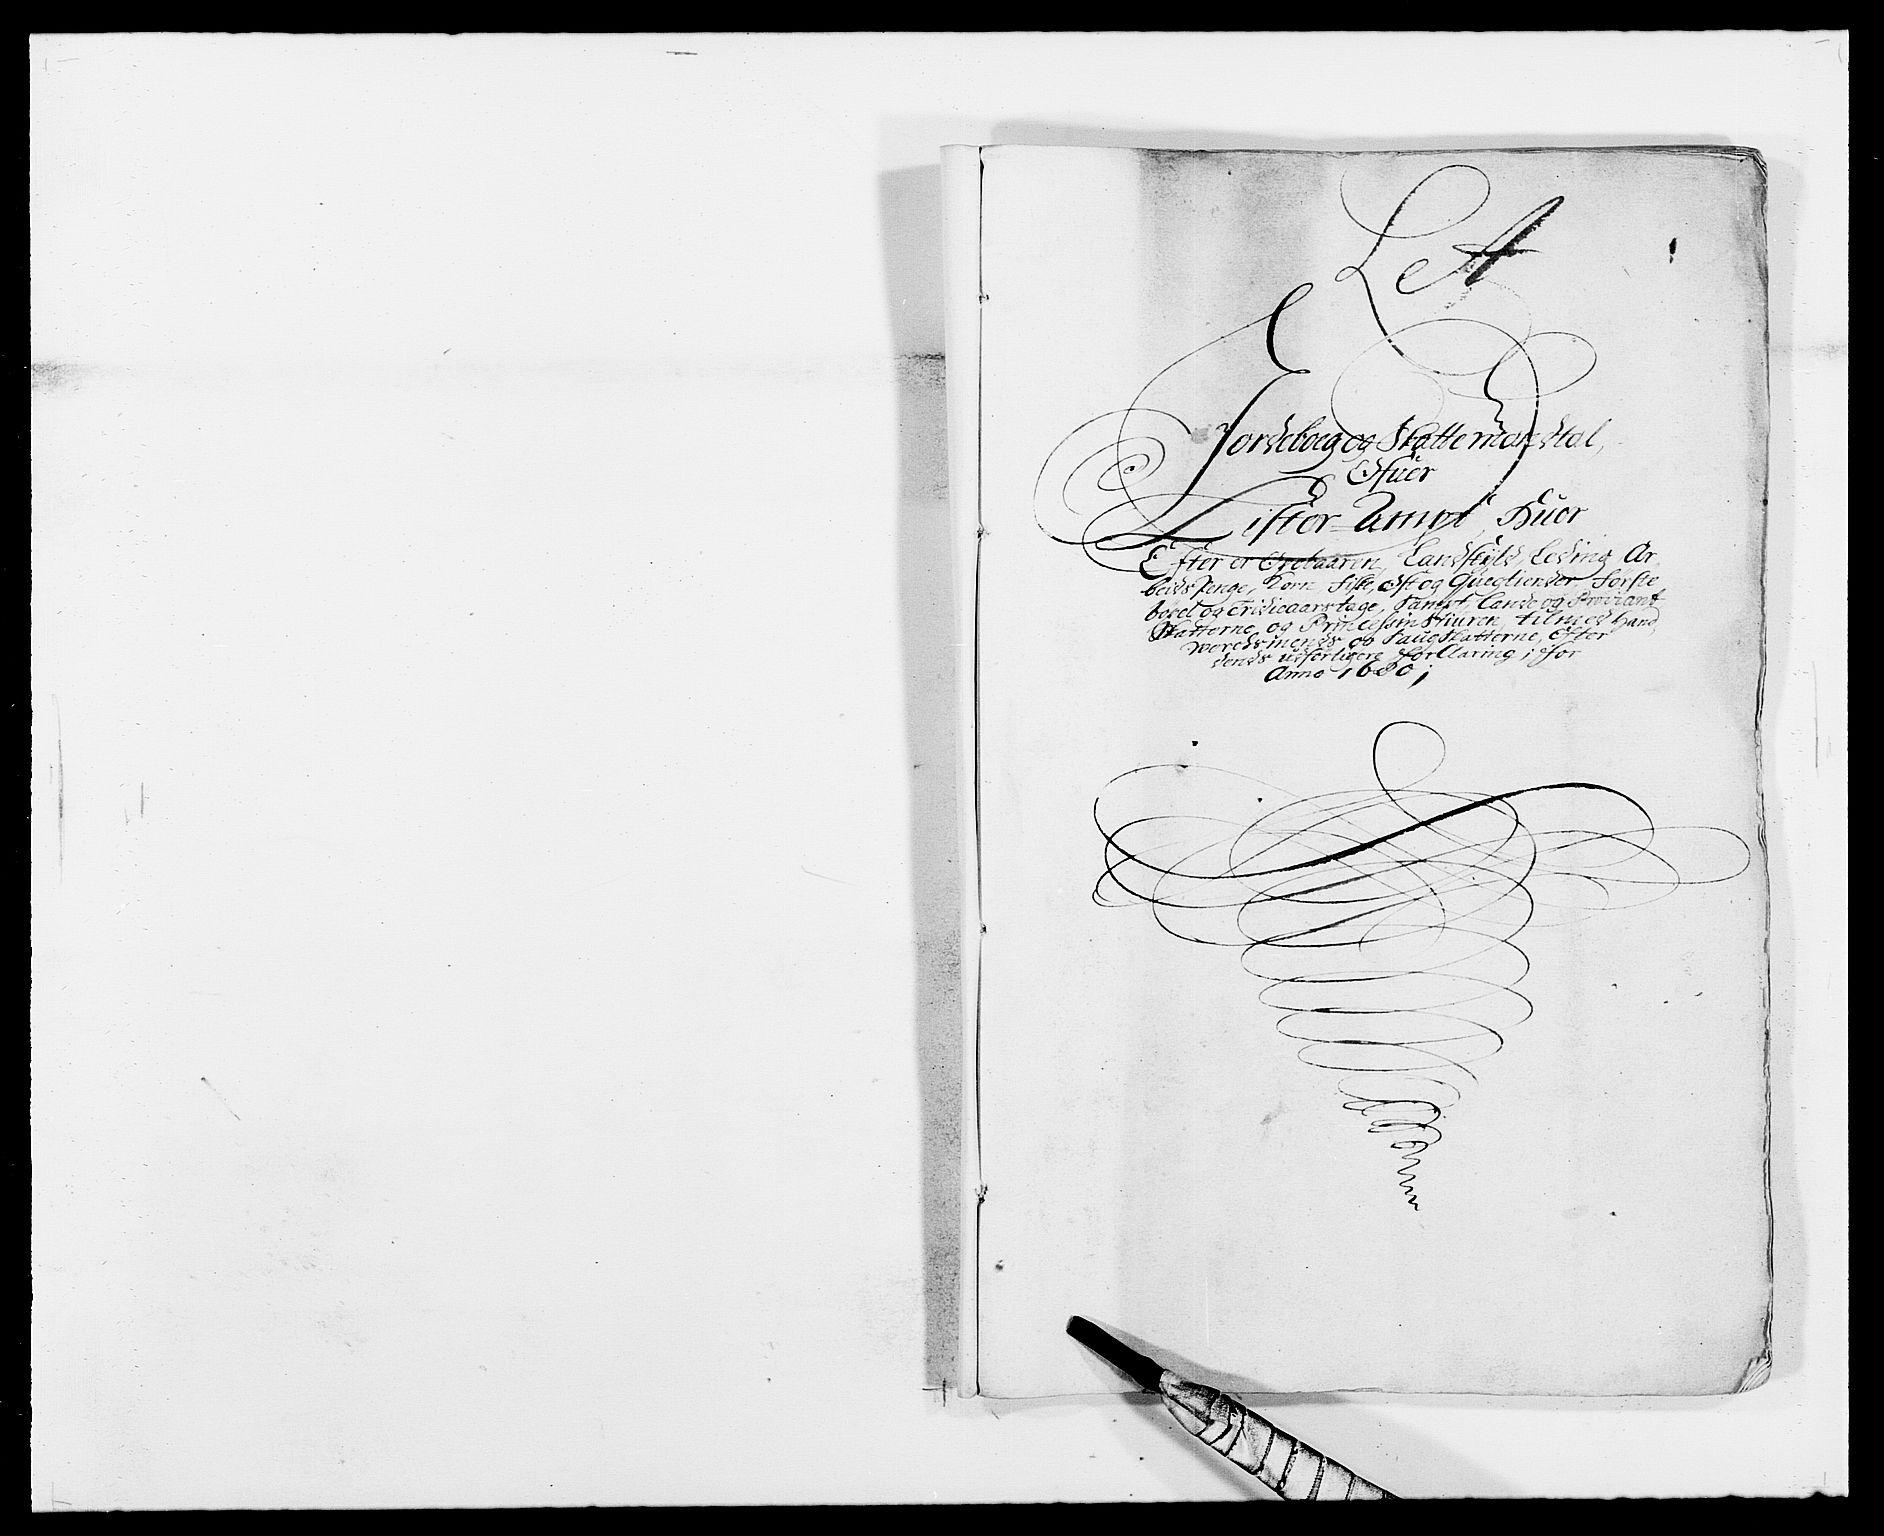 RA, Rentekammeret inntil 1814, Reviderte regnskaper, Fogderegnskap, R41/L2531: Fogderegnskap Lista, 1680-1682, s. 4